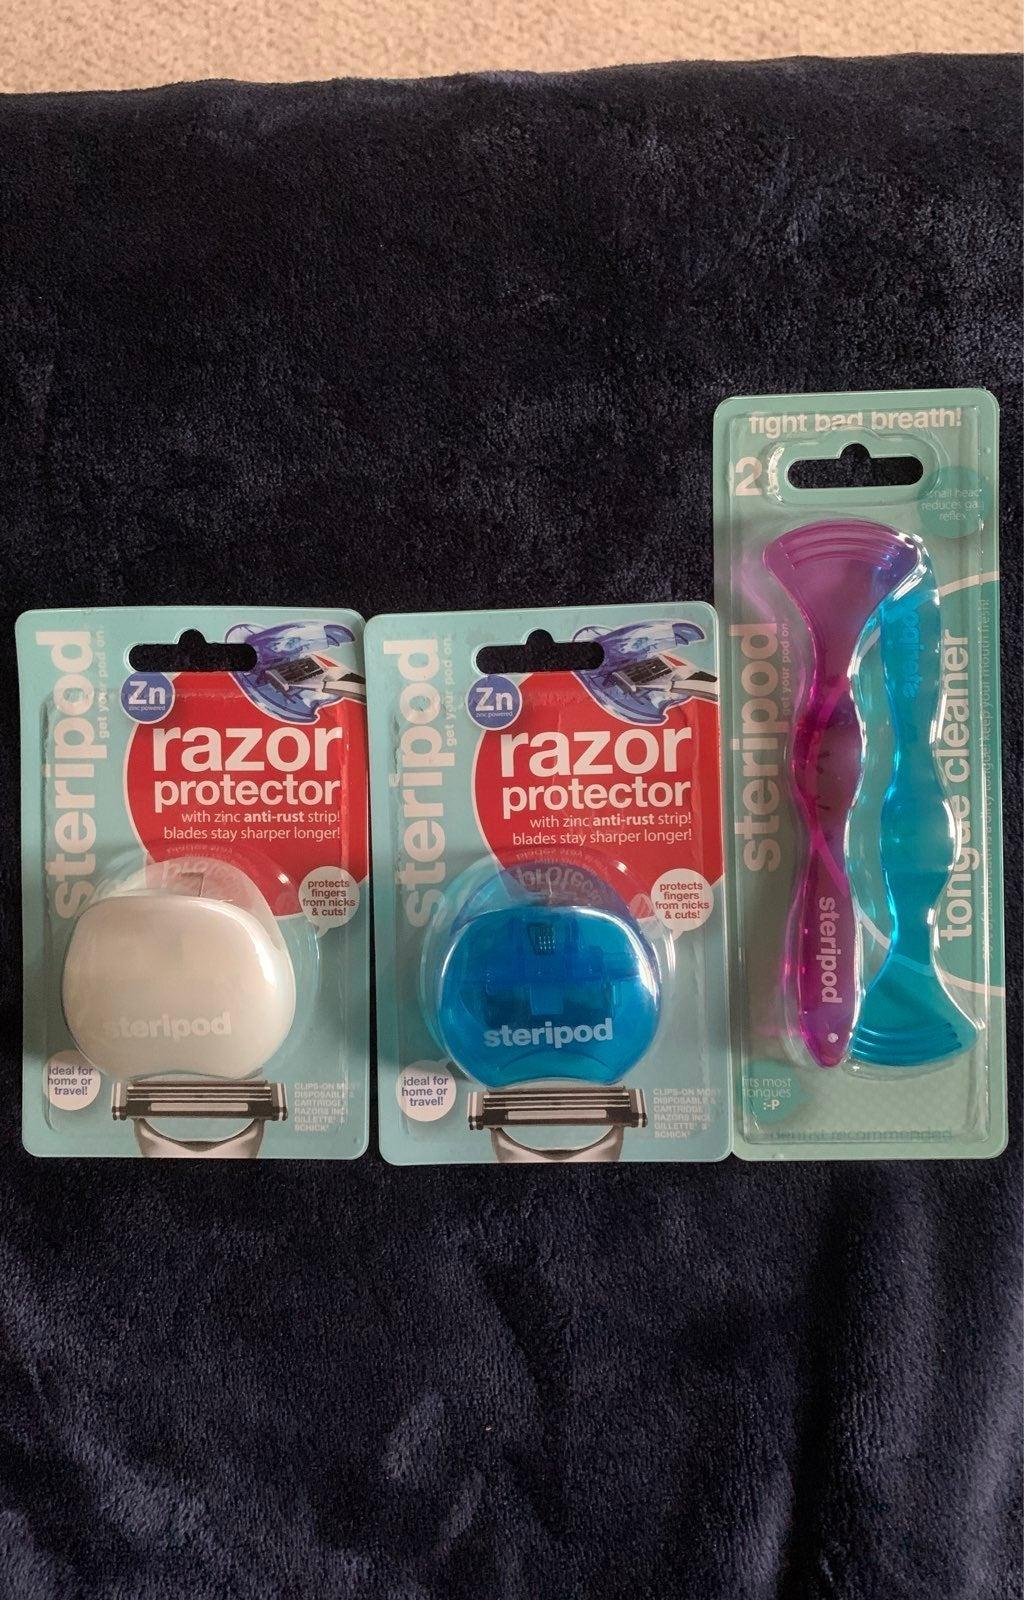 Steripod Razor Protector/Tongue Cleaner